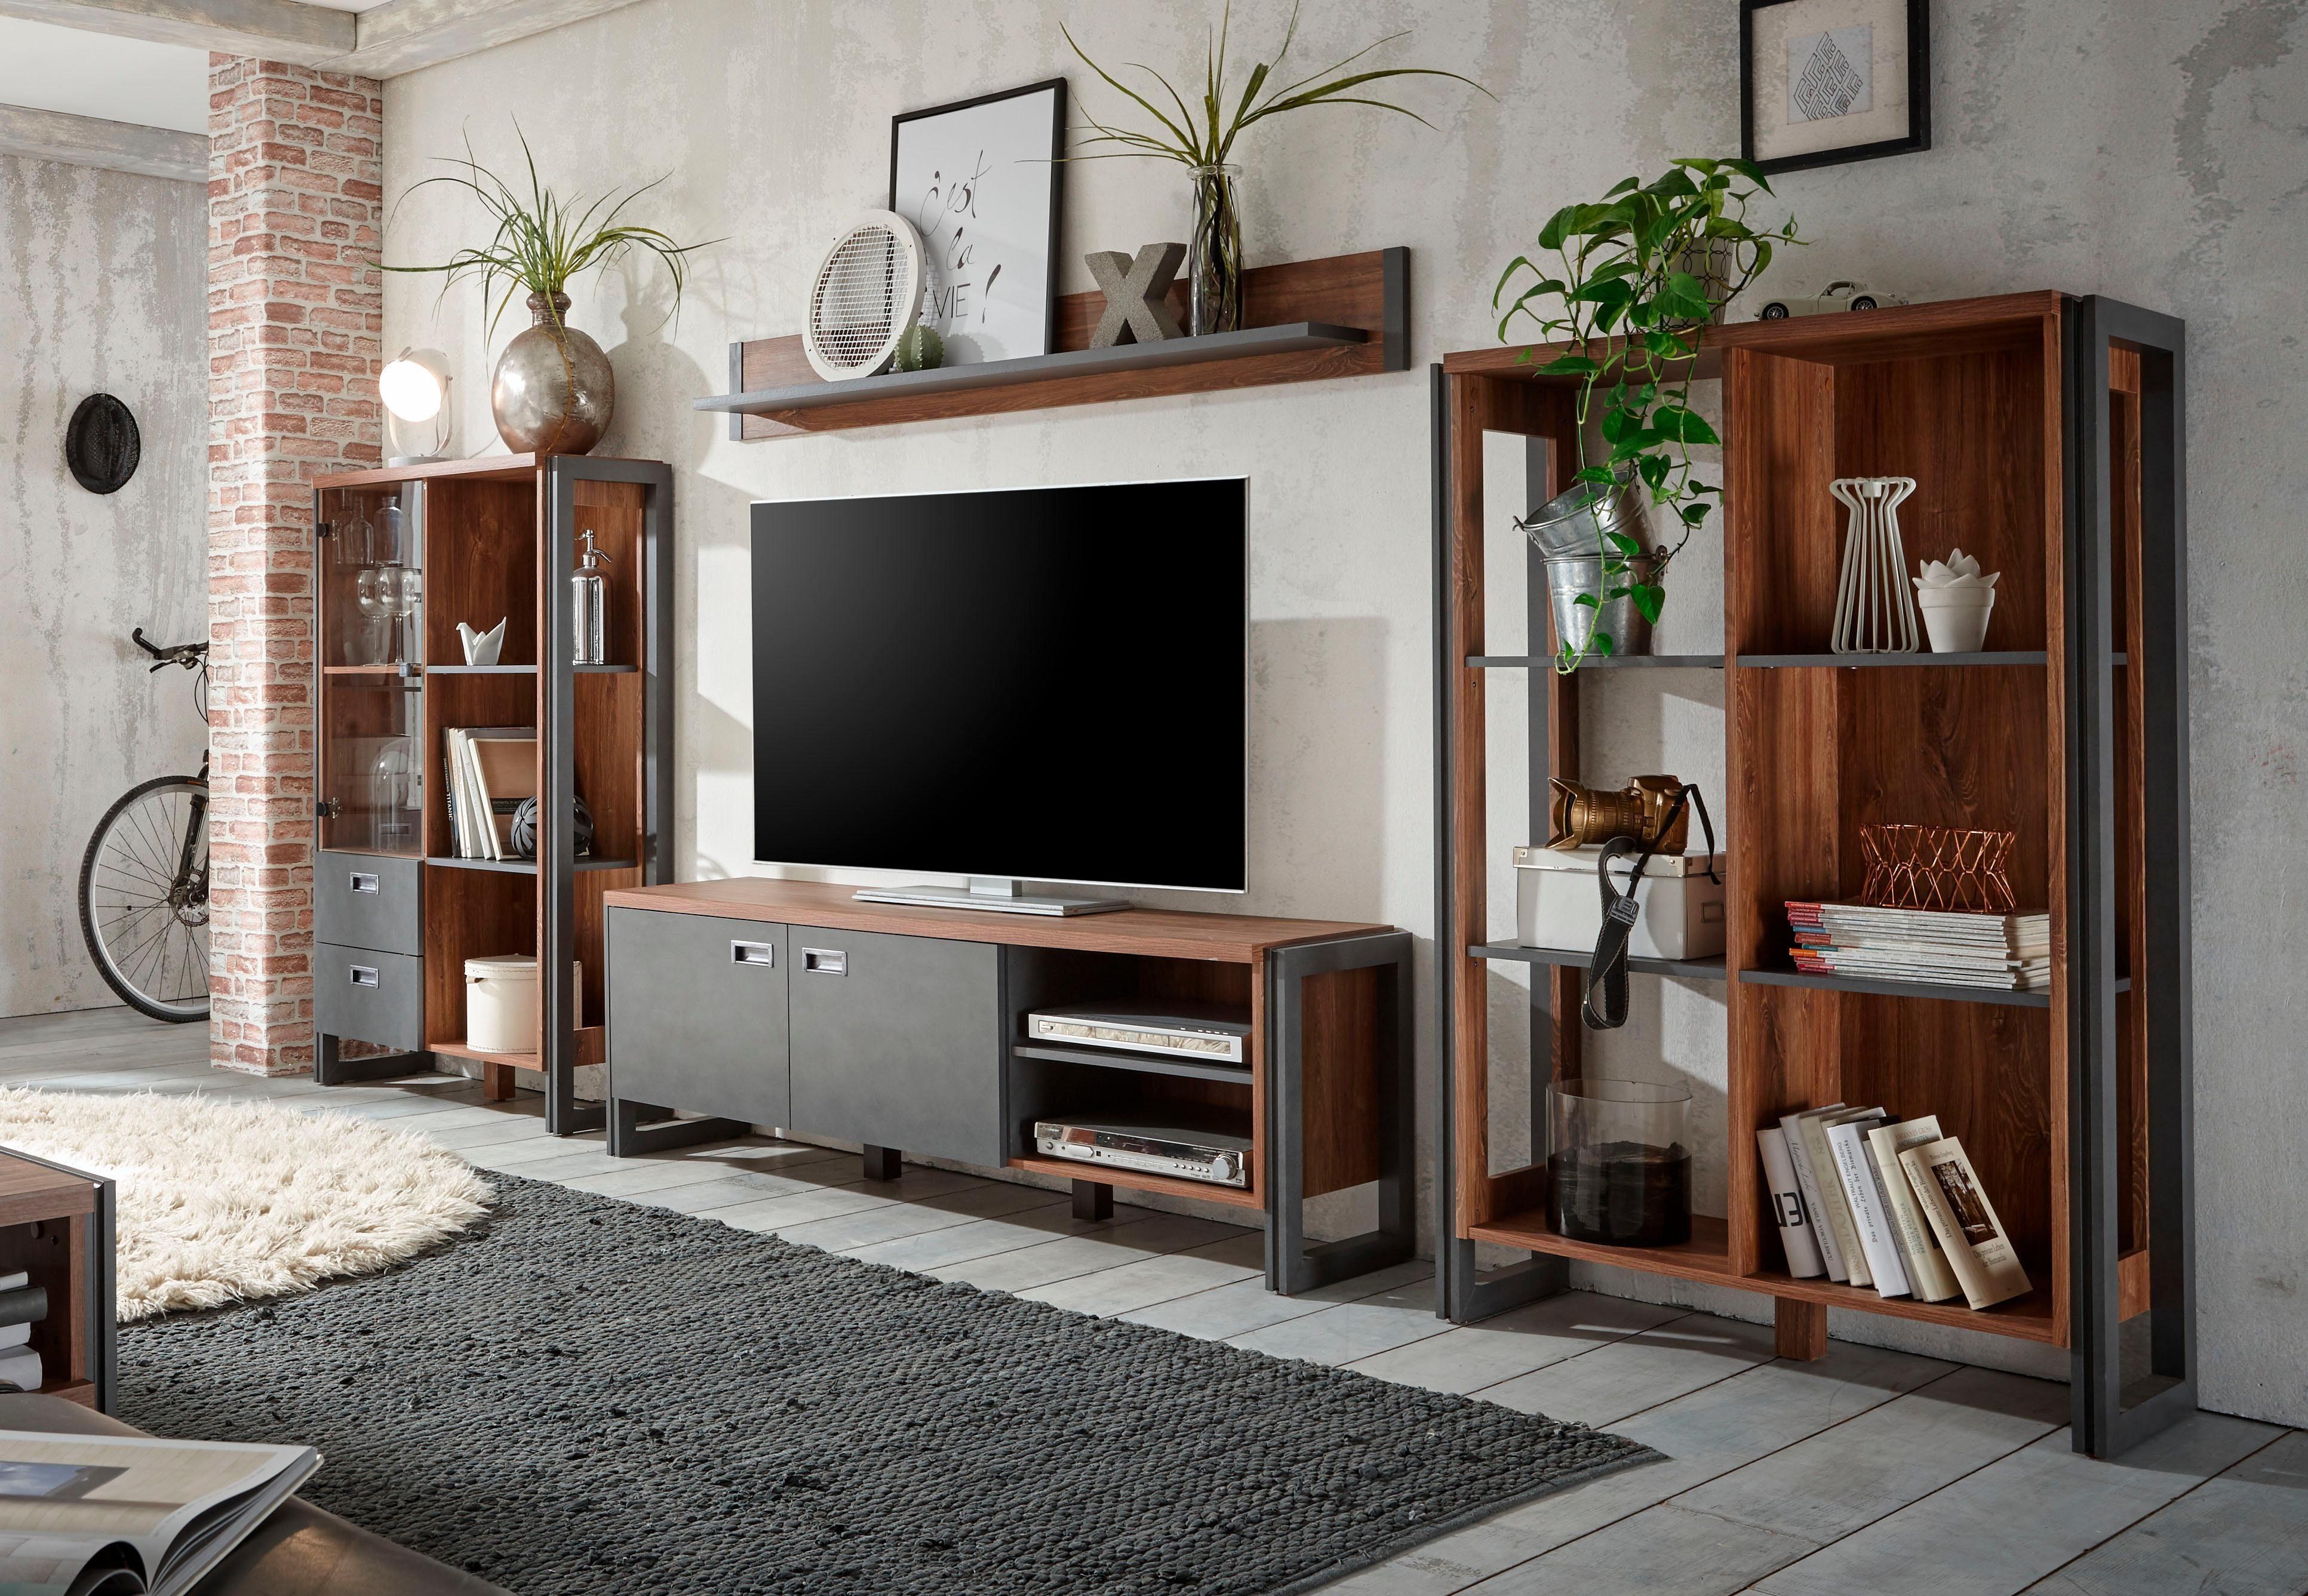 Wohnwand Mezzo Style : Design wohnwande style sourcecrave